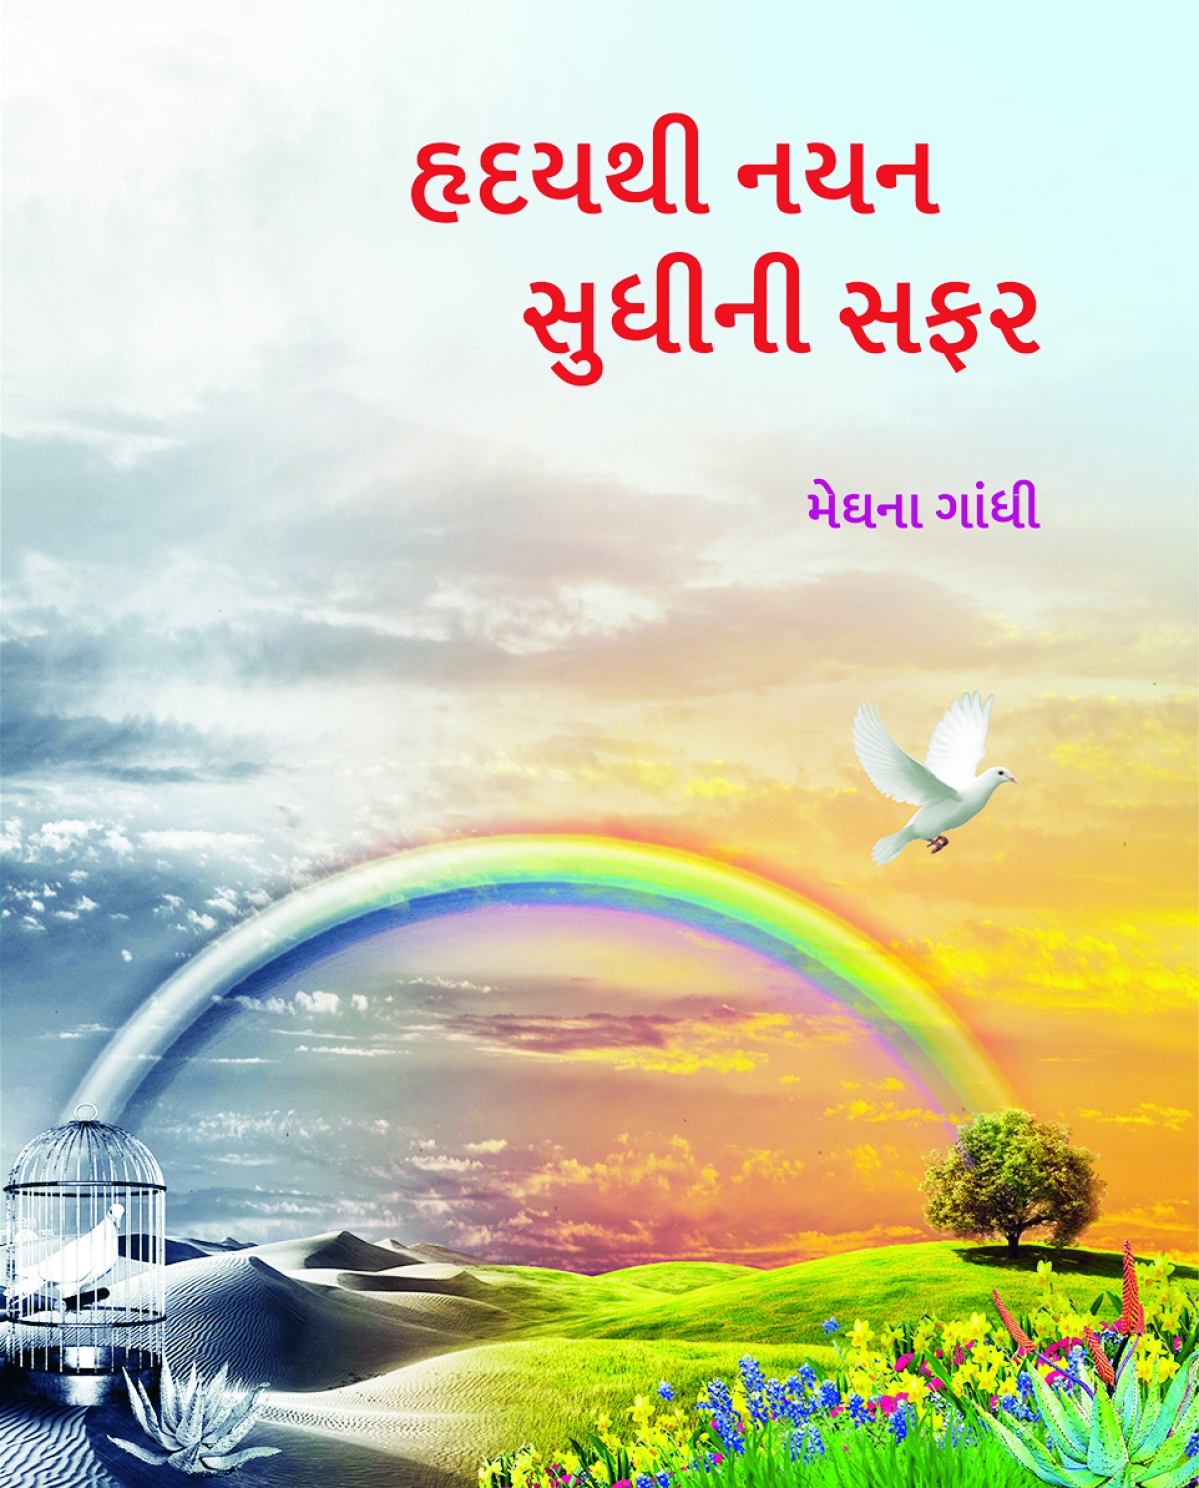 'Hriday thi Nayan Sudhini Safar' - A Book By Meghana Gandhi